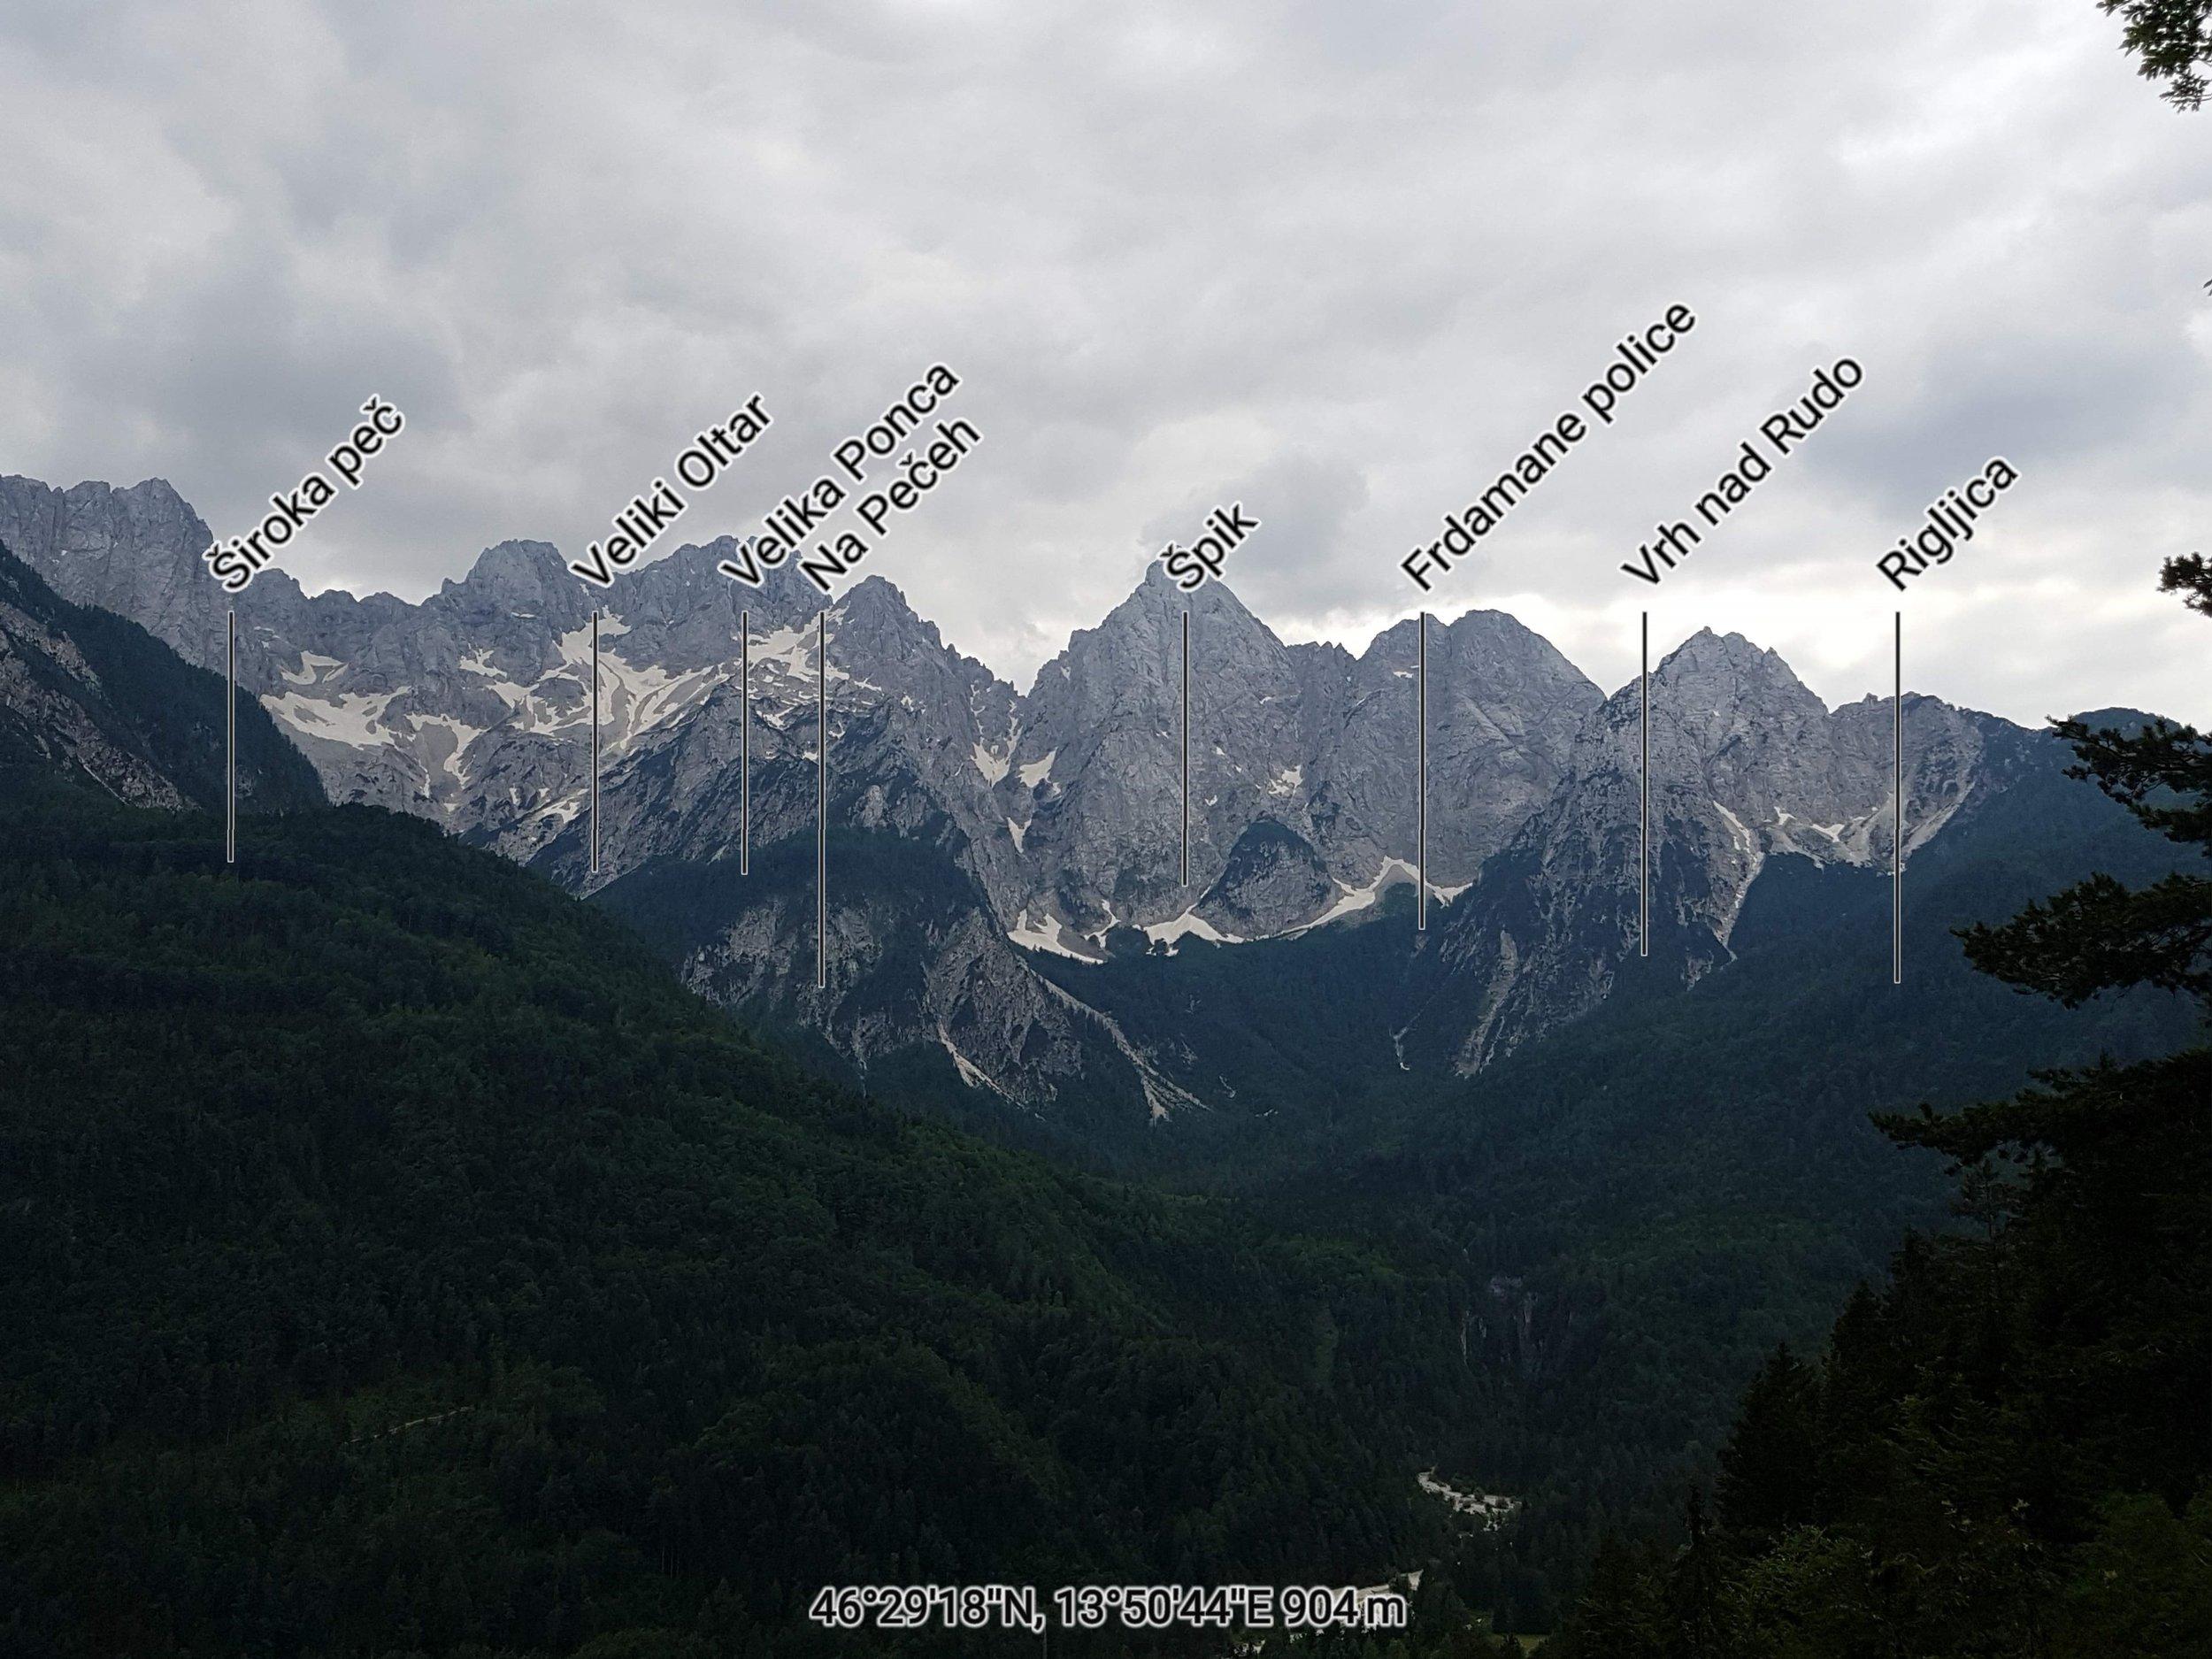 Martuljk group of mountains